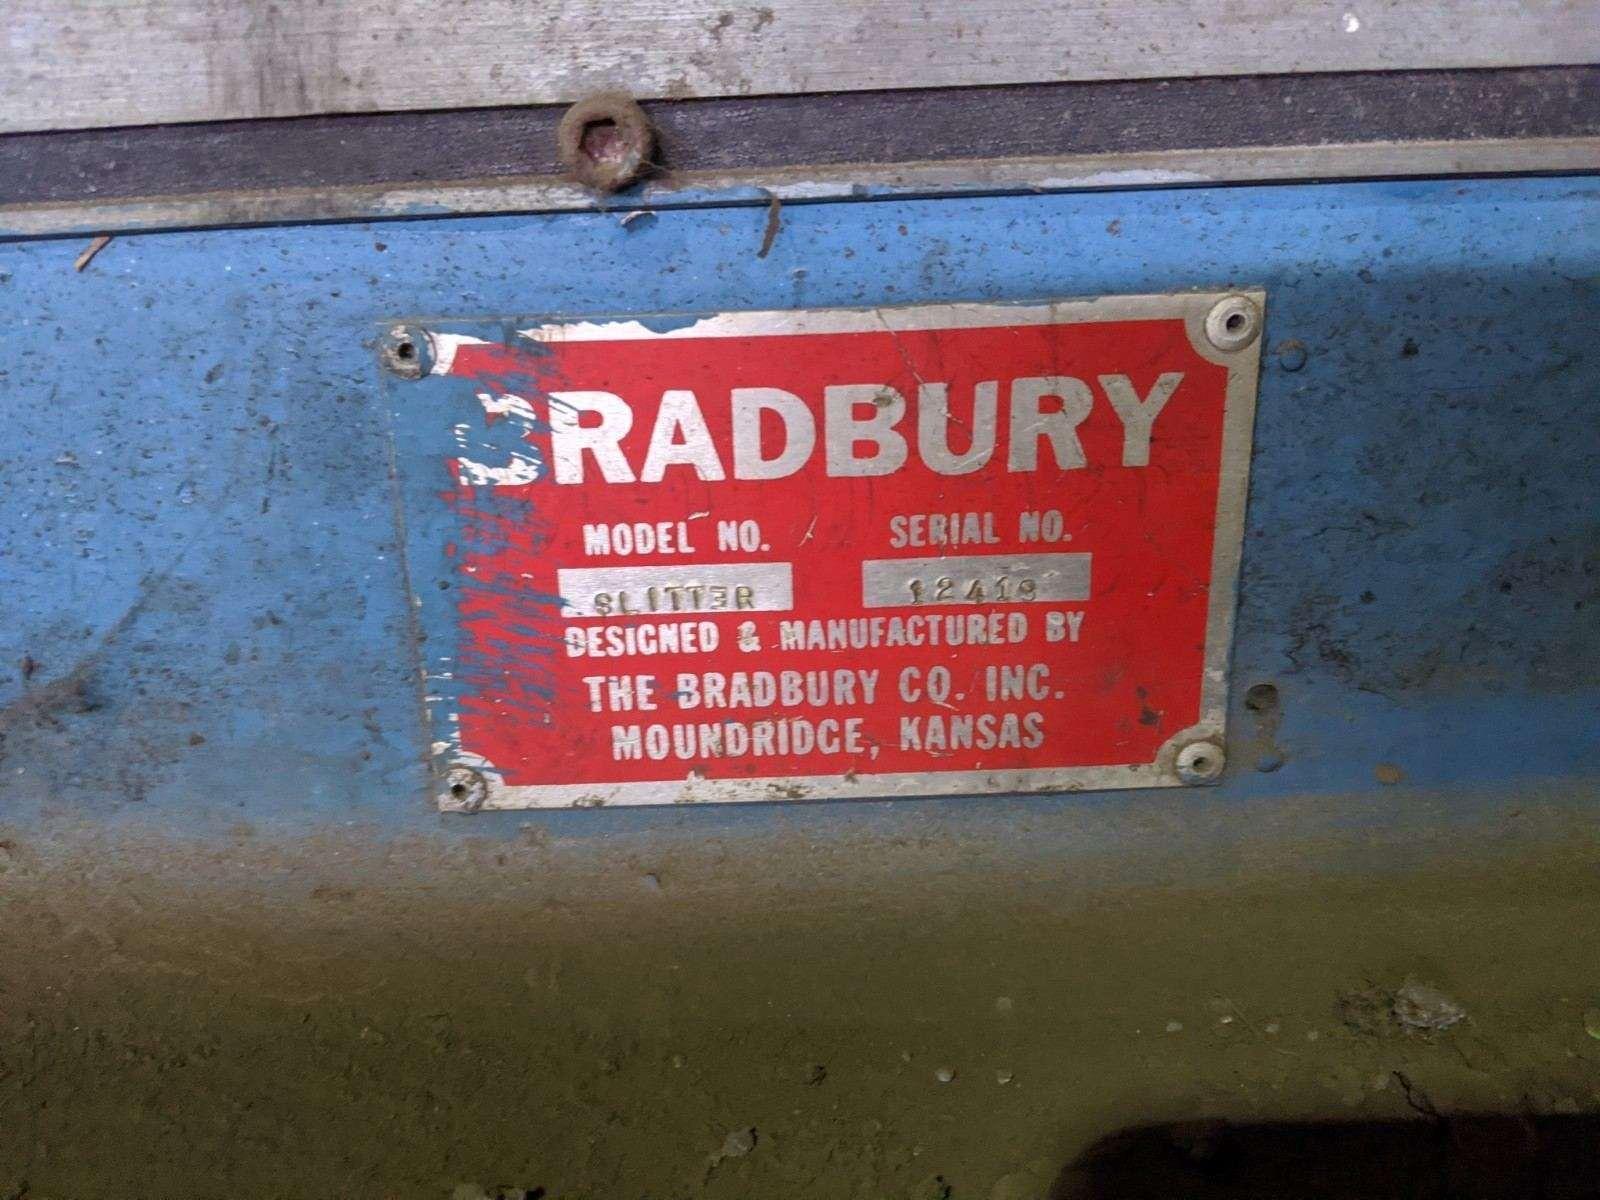 "96"" BRADBURY SLITTER AND SKEW TABLE"